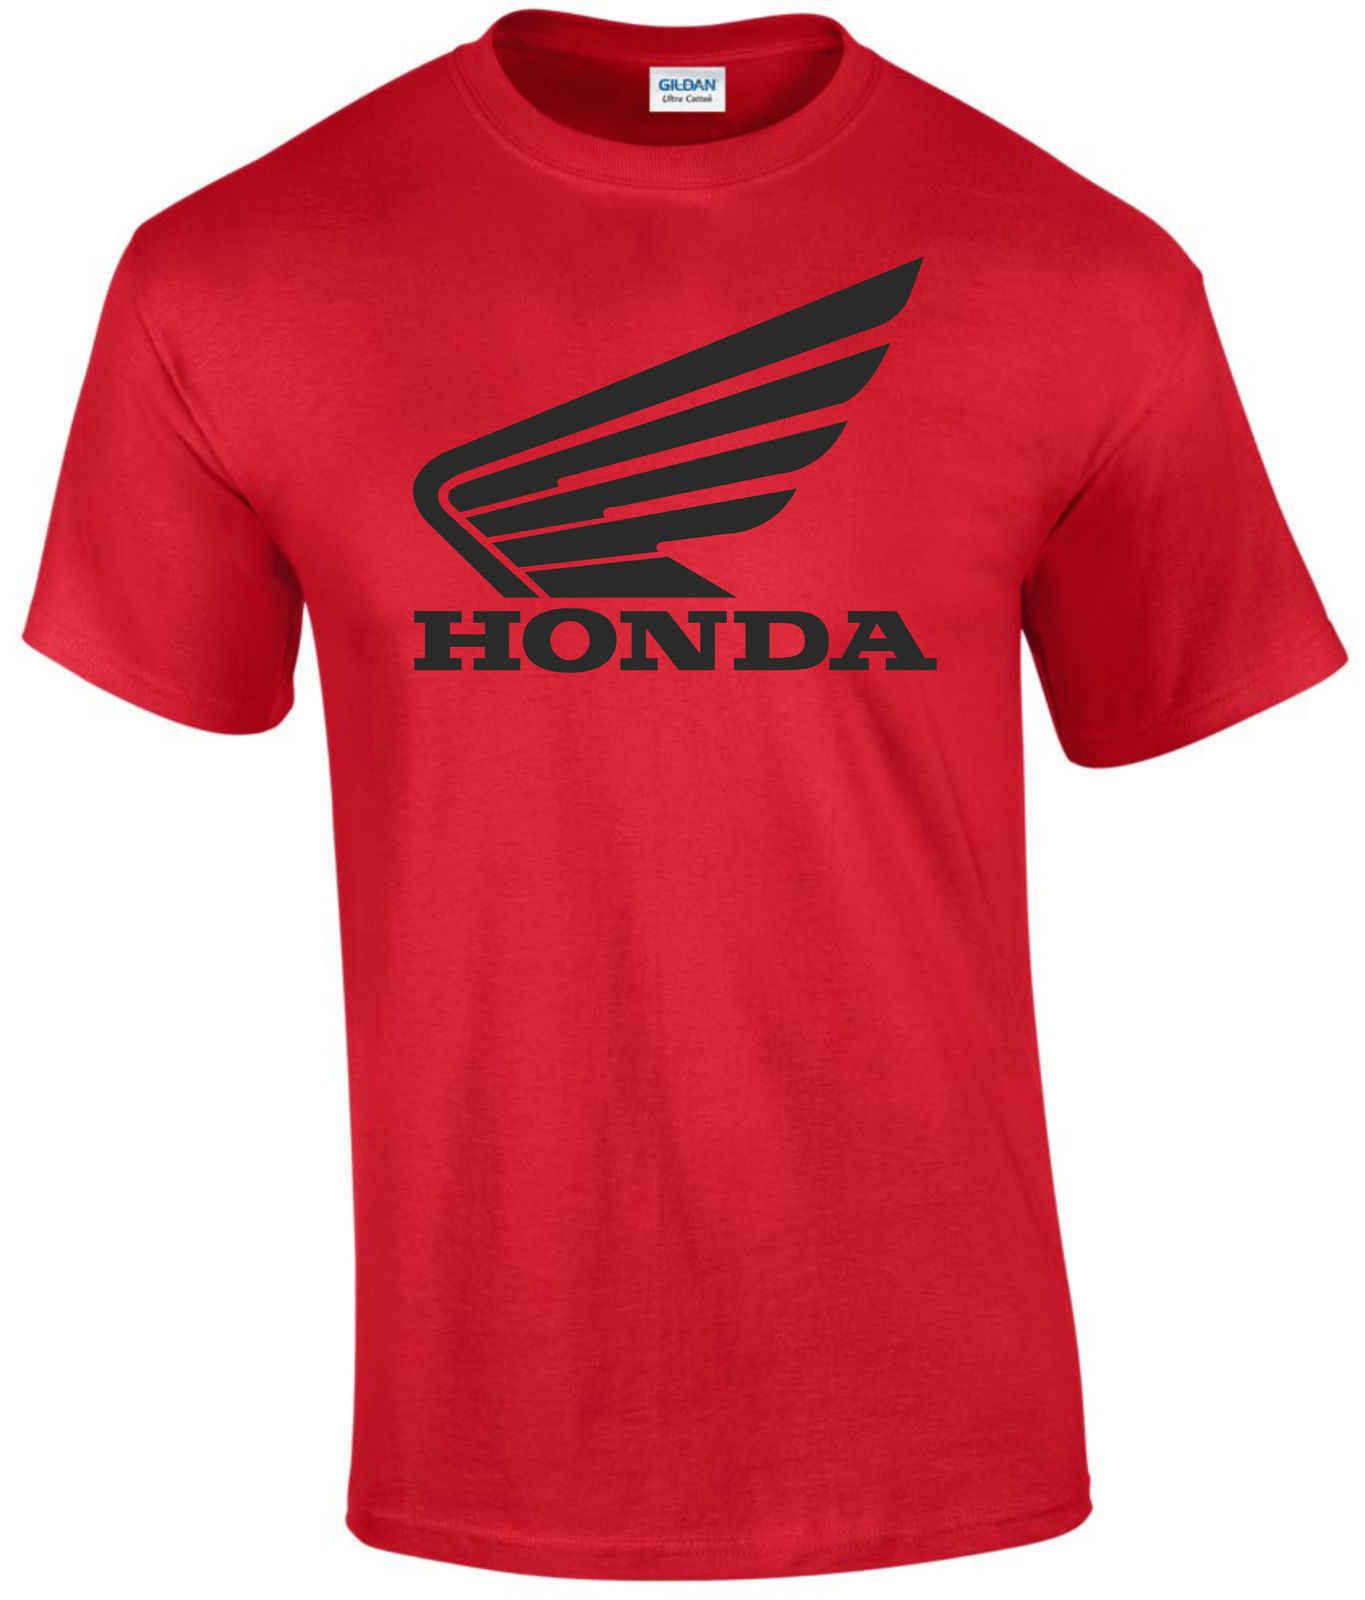 Honda Suzuki Motorfiets T-shirt Zomer Heren Dragen Katoen Ronde Kraag T-shirt Sport Casual Puur Katoen Korte Mouwen T-shirt